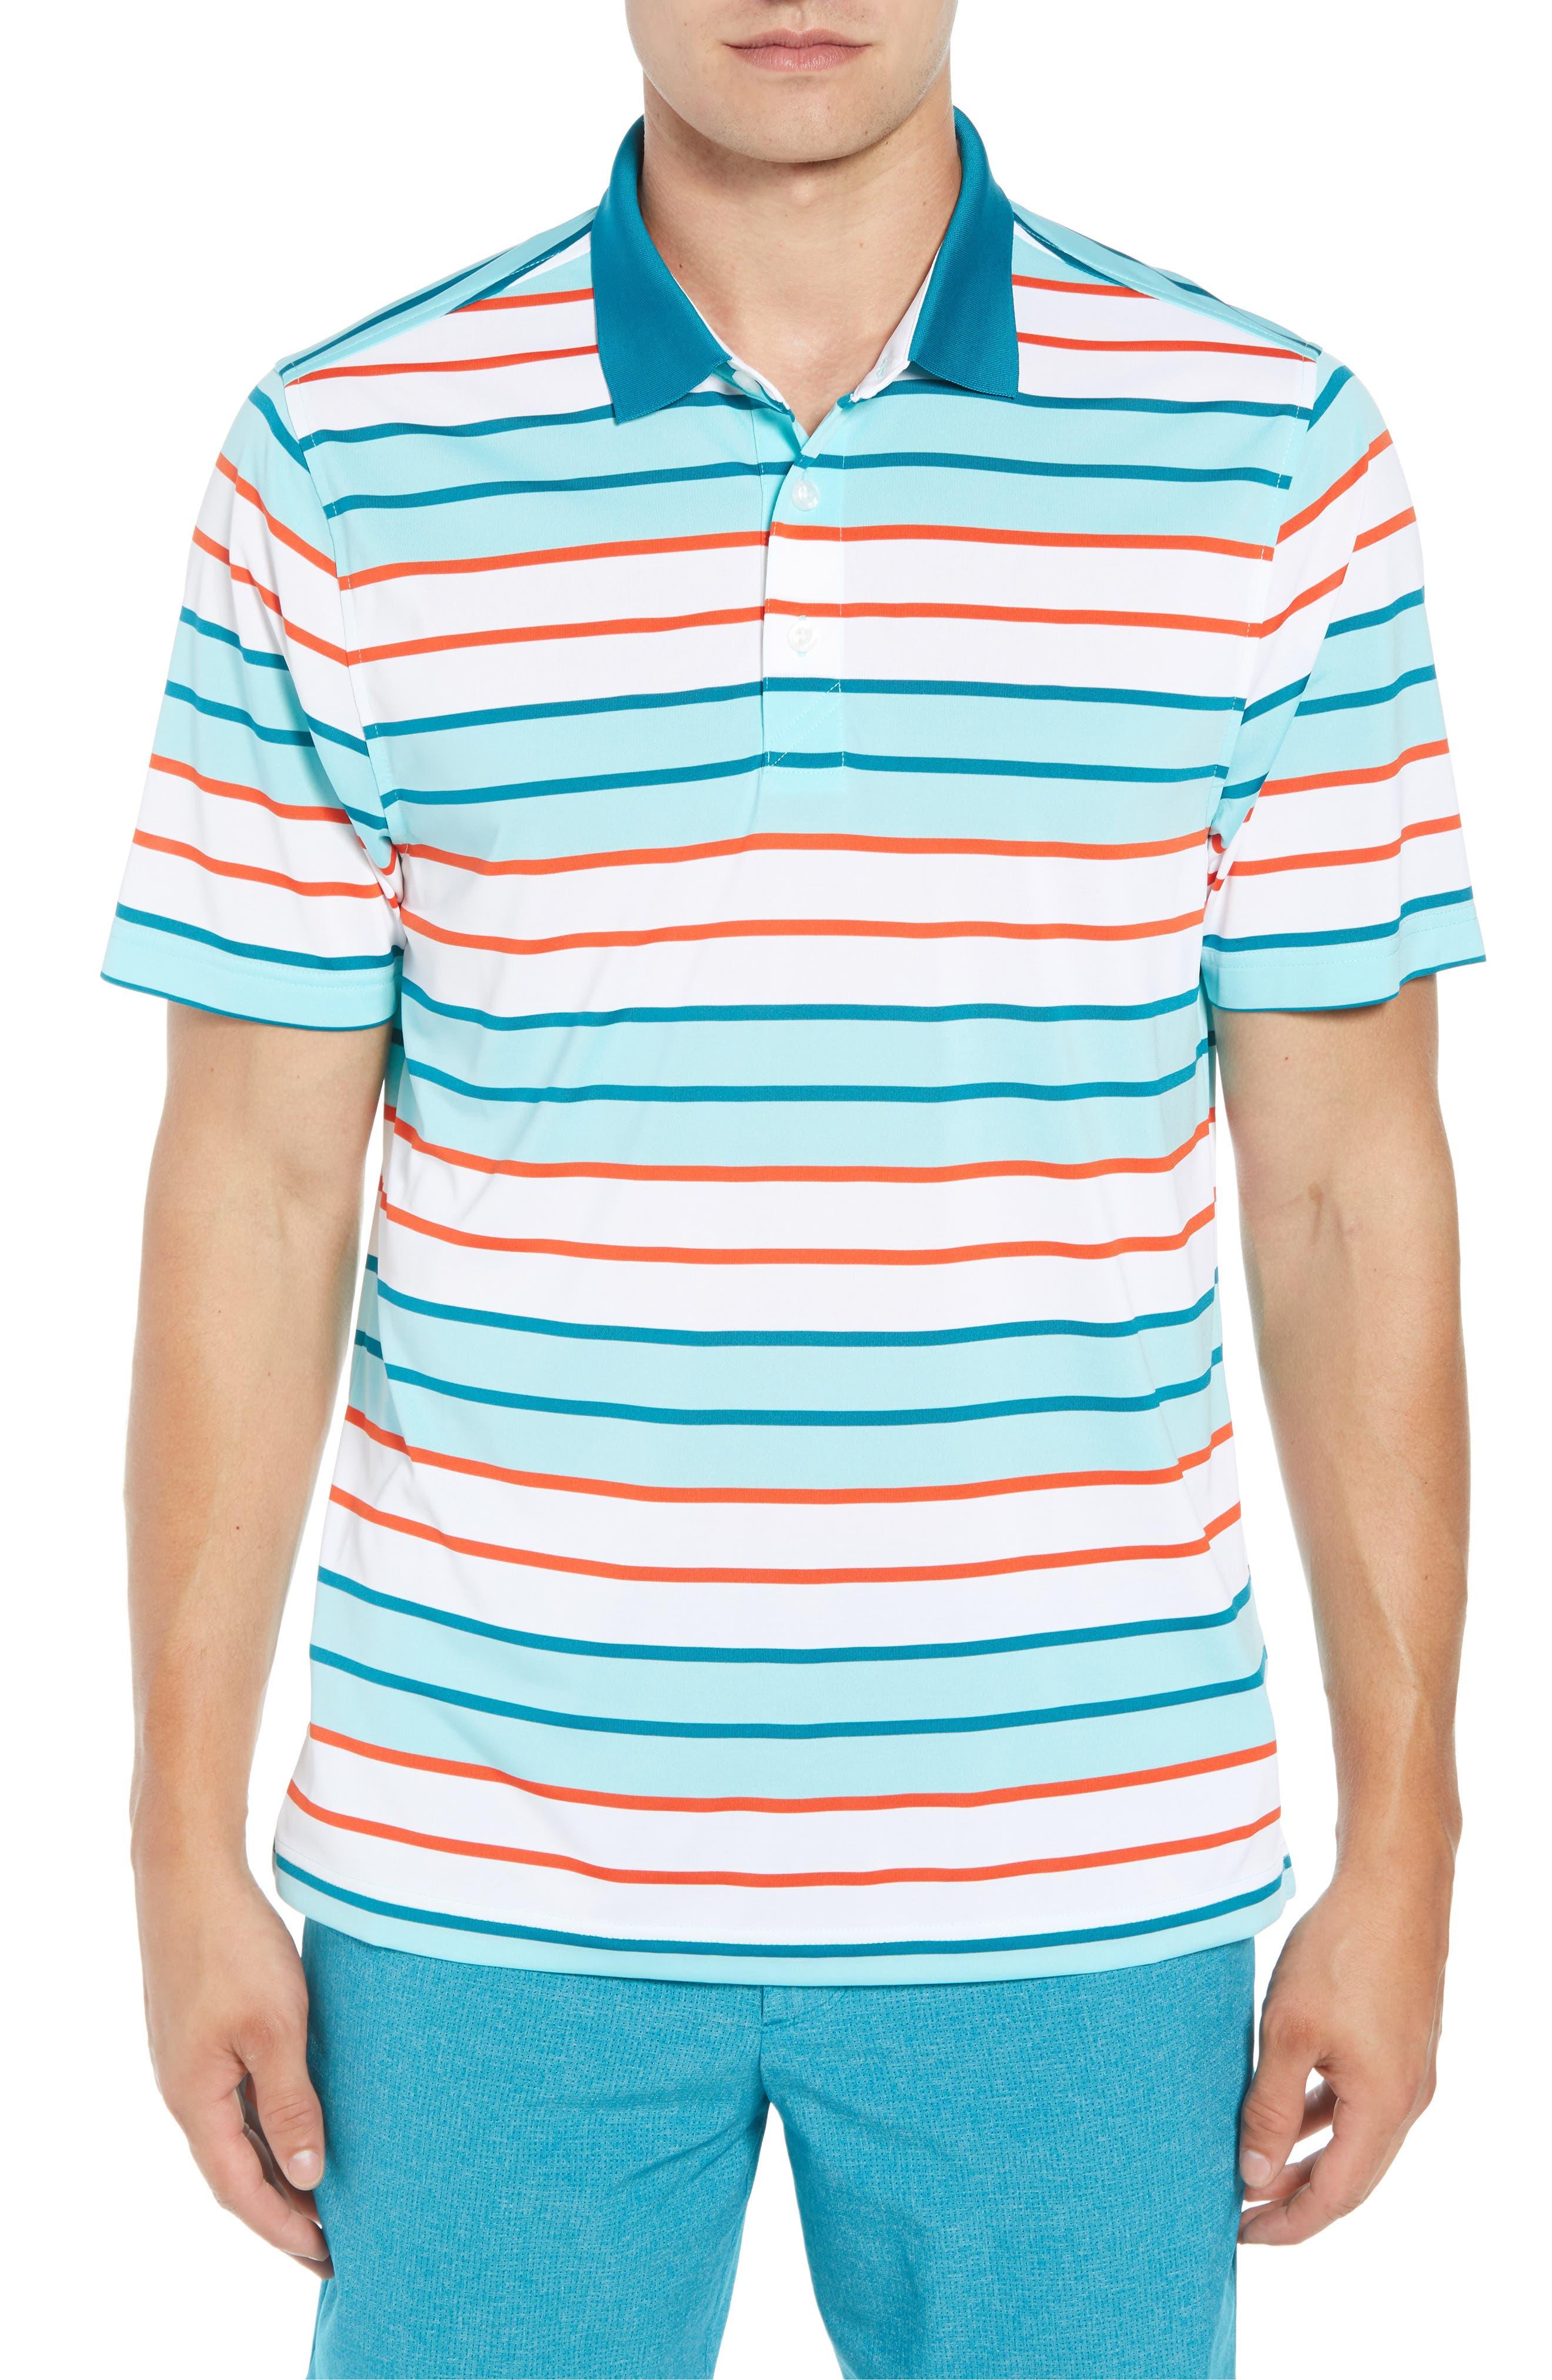 Cody DryTec Striped Polo,                         Main,                         color, AQUATIC